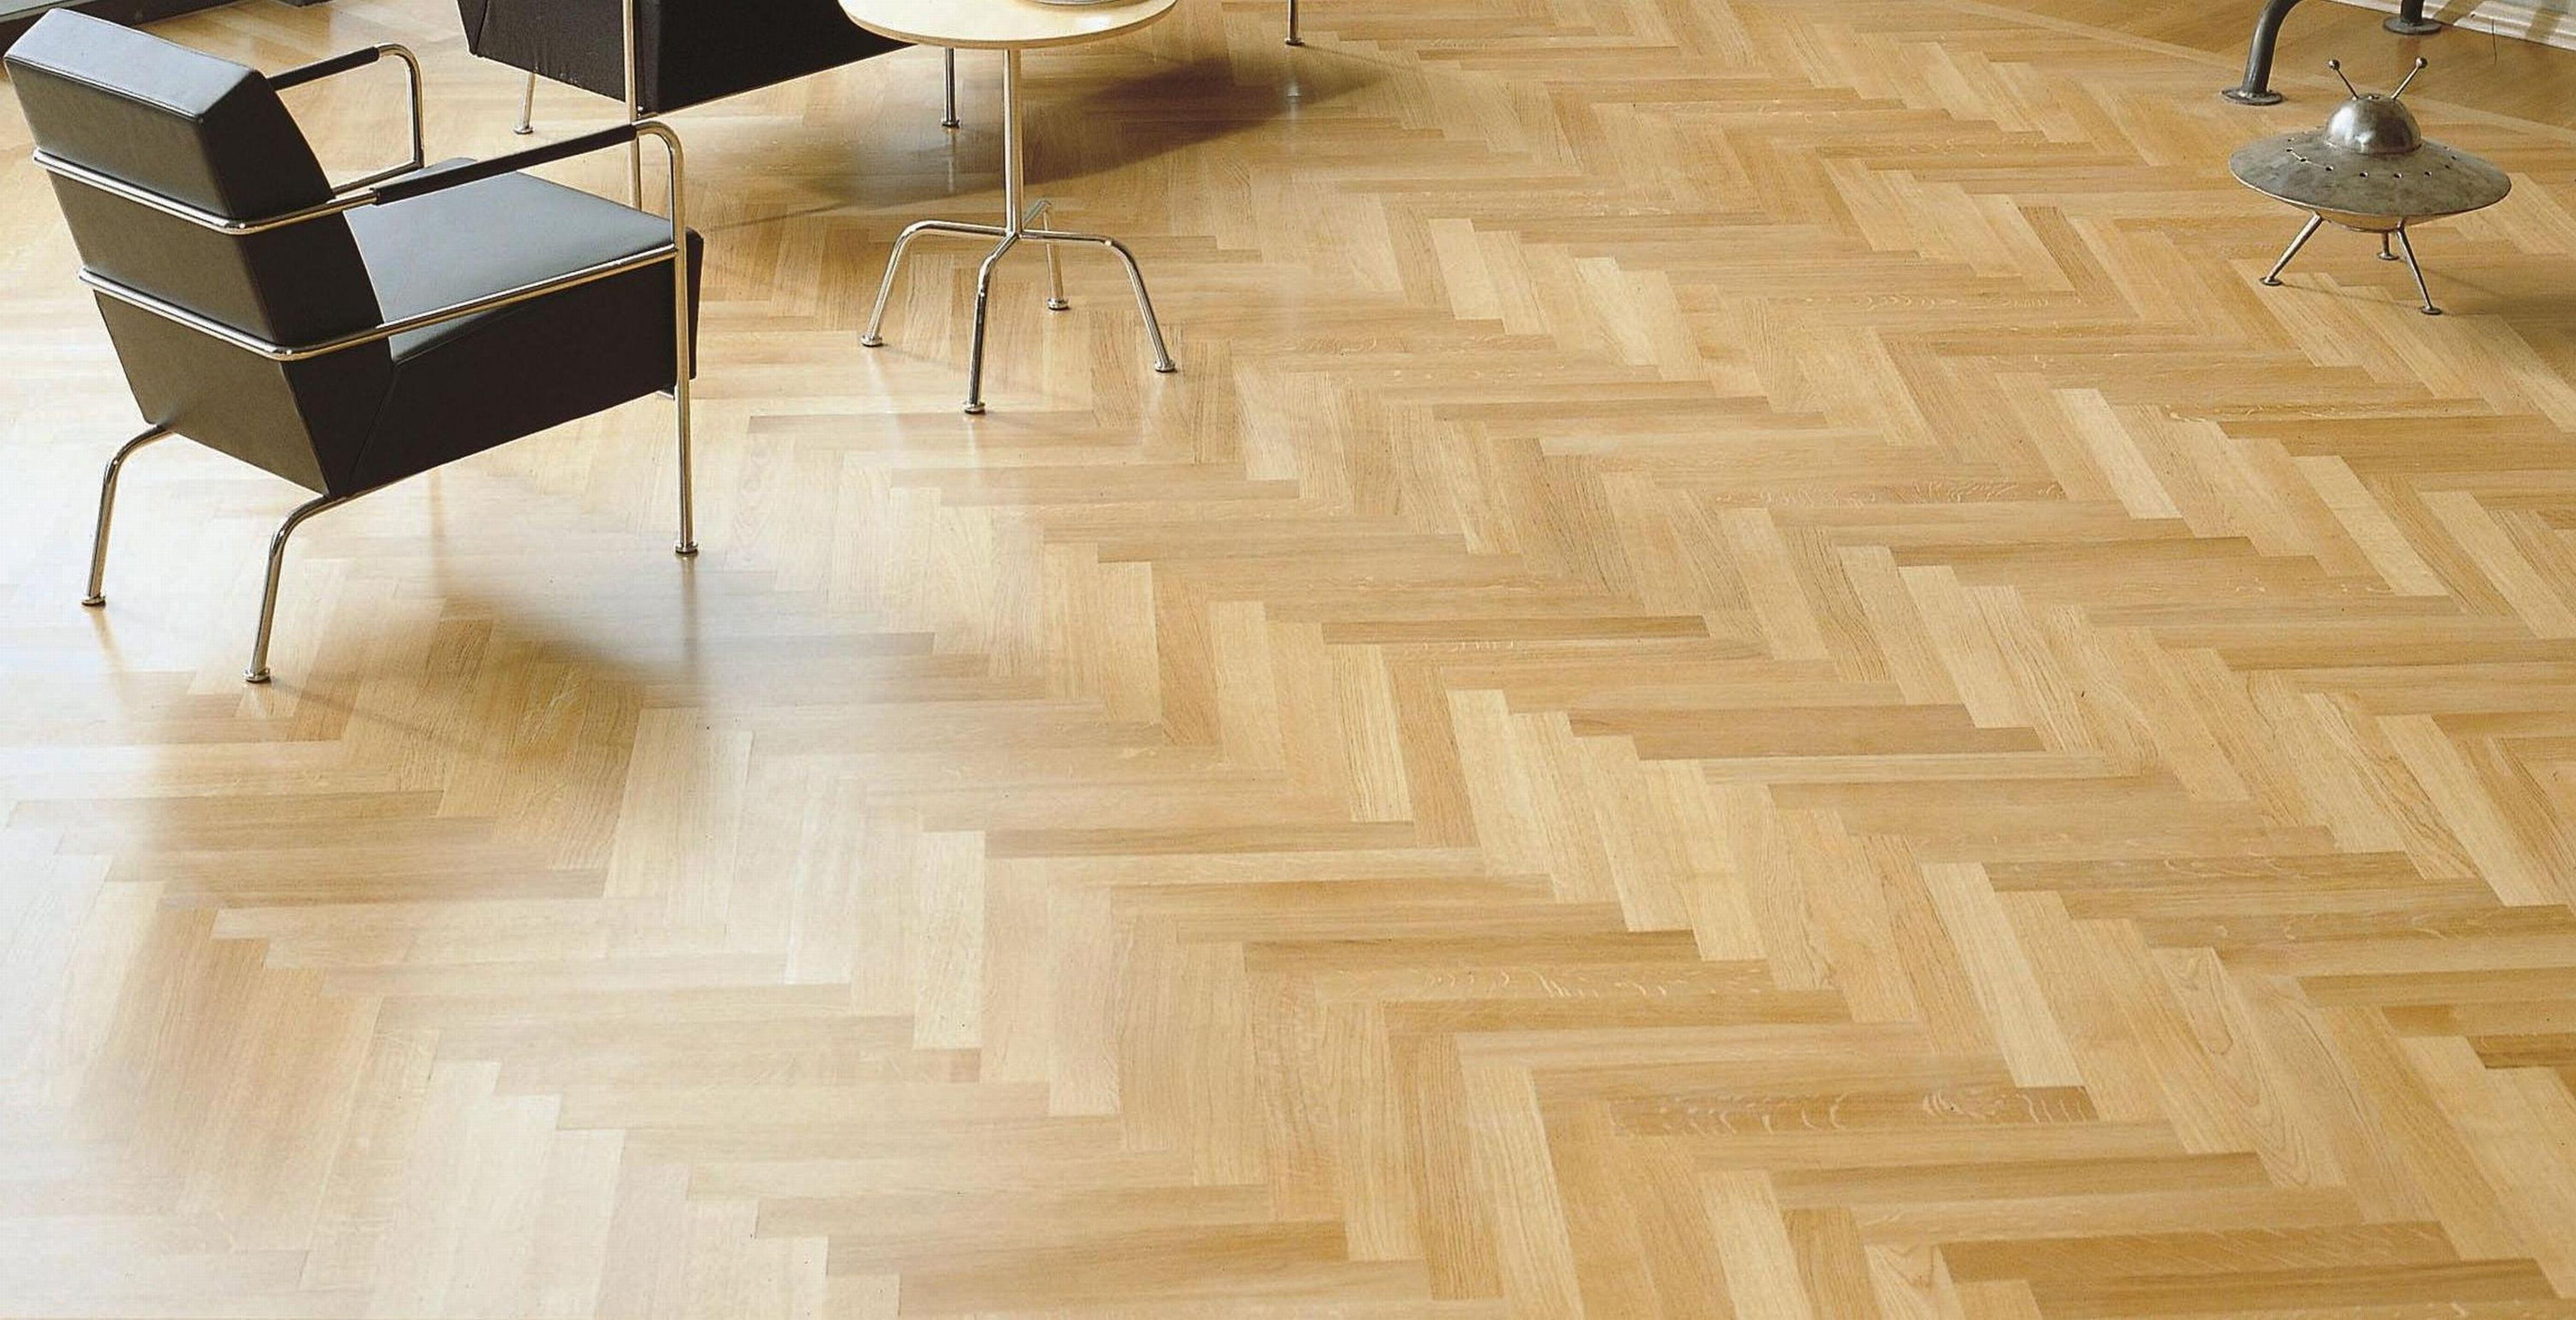 Contemporary Parquet Wood Flooring Wood Parquet Flooring